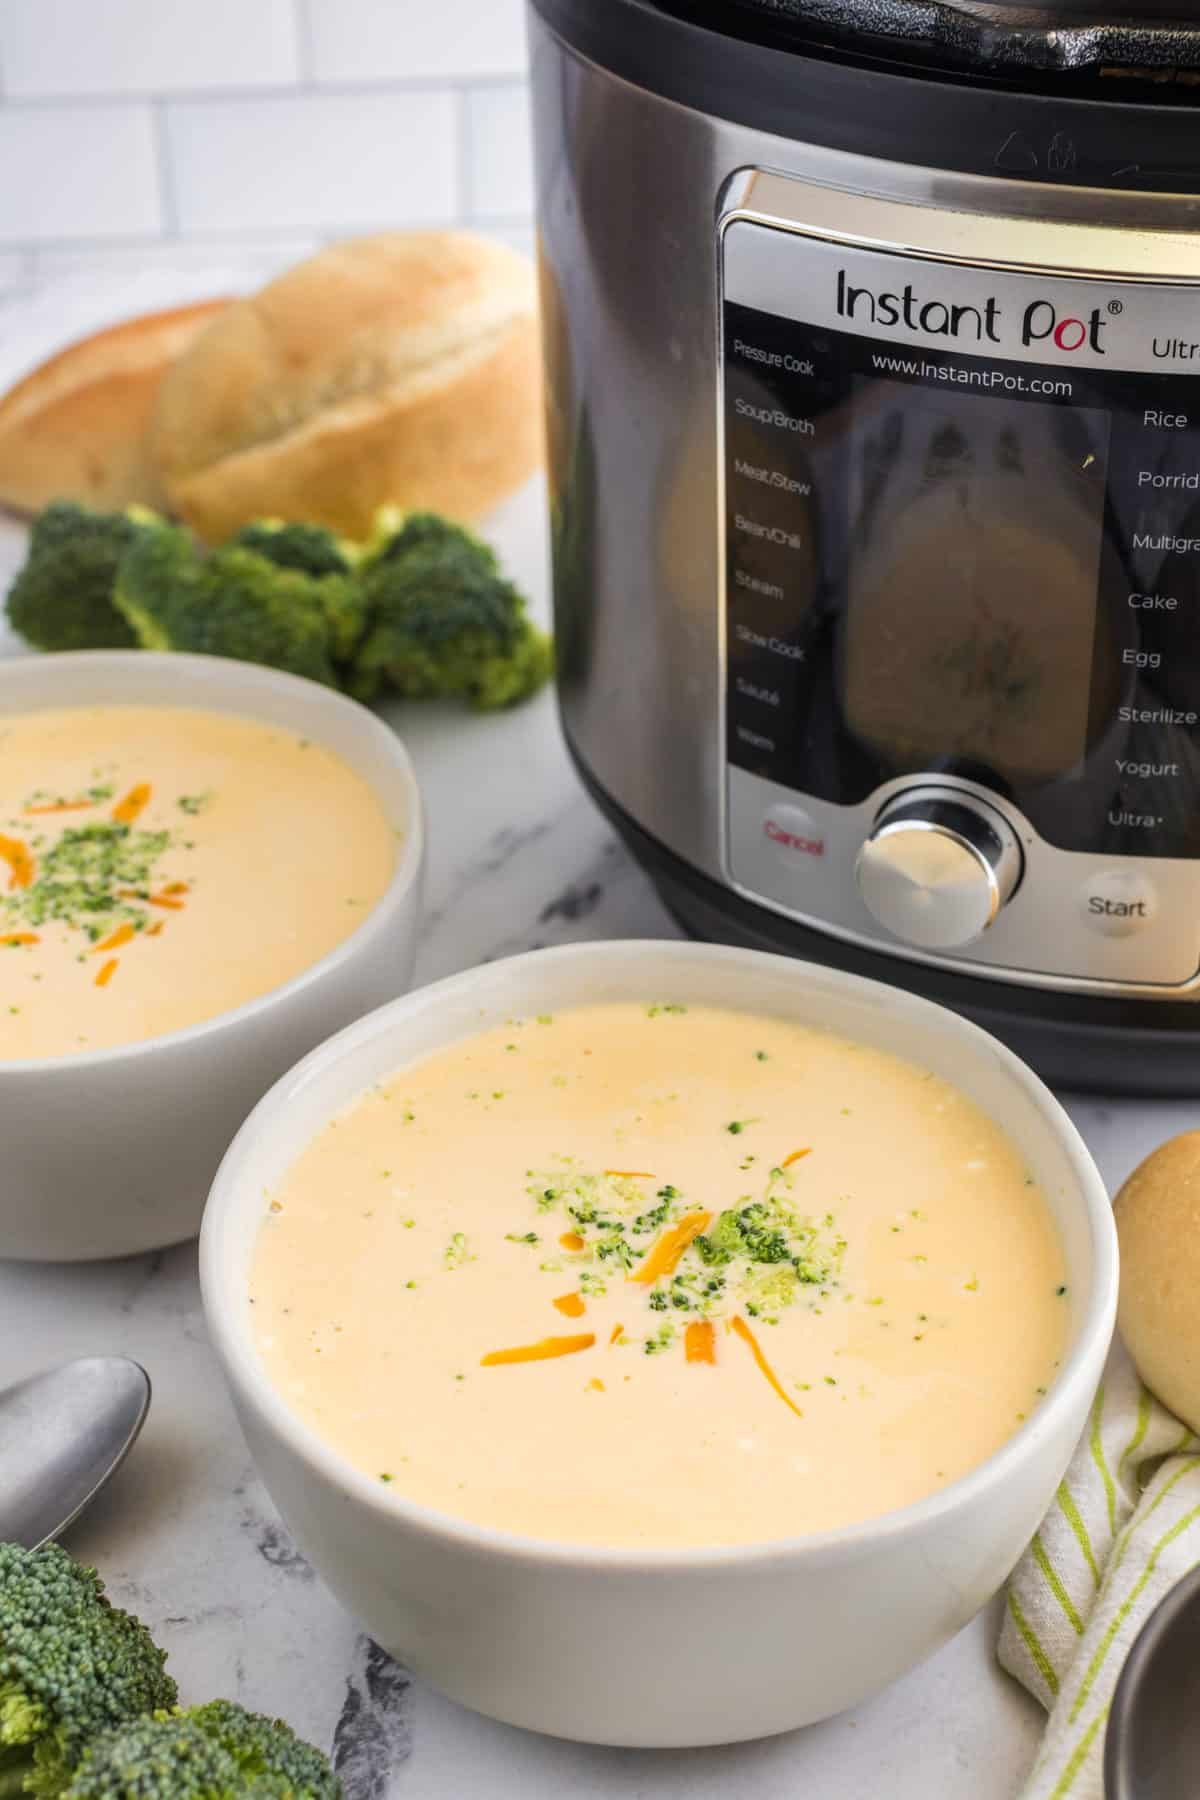 Instant Pot Copycat Panera's Broccoli and Cheddar Soup